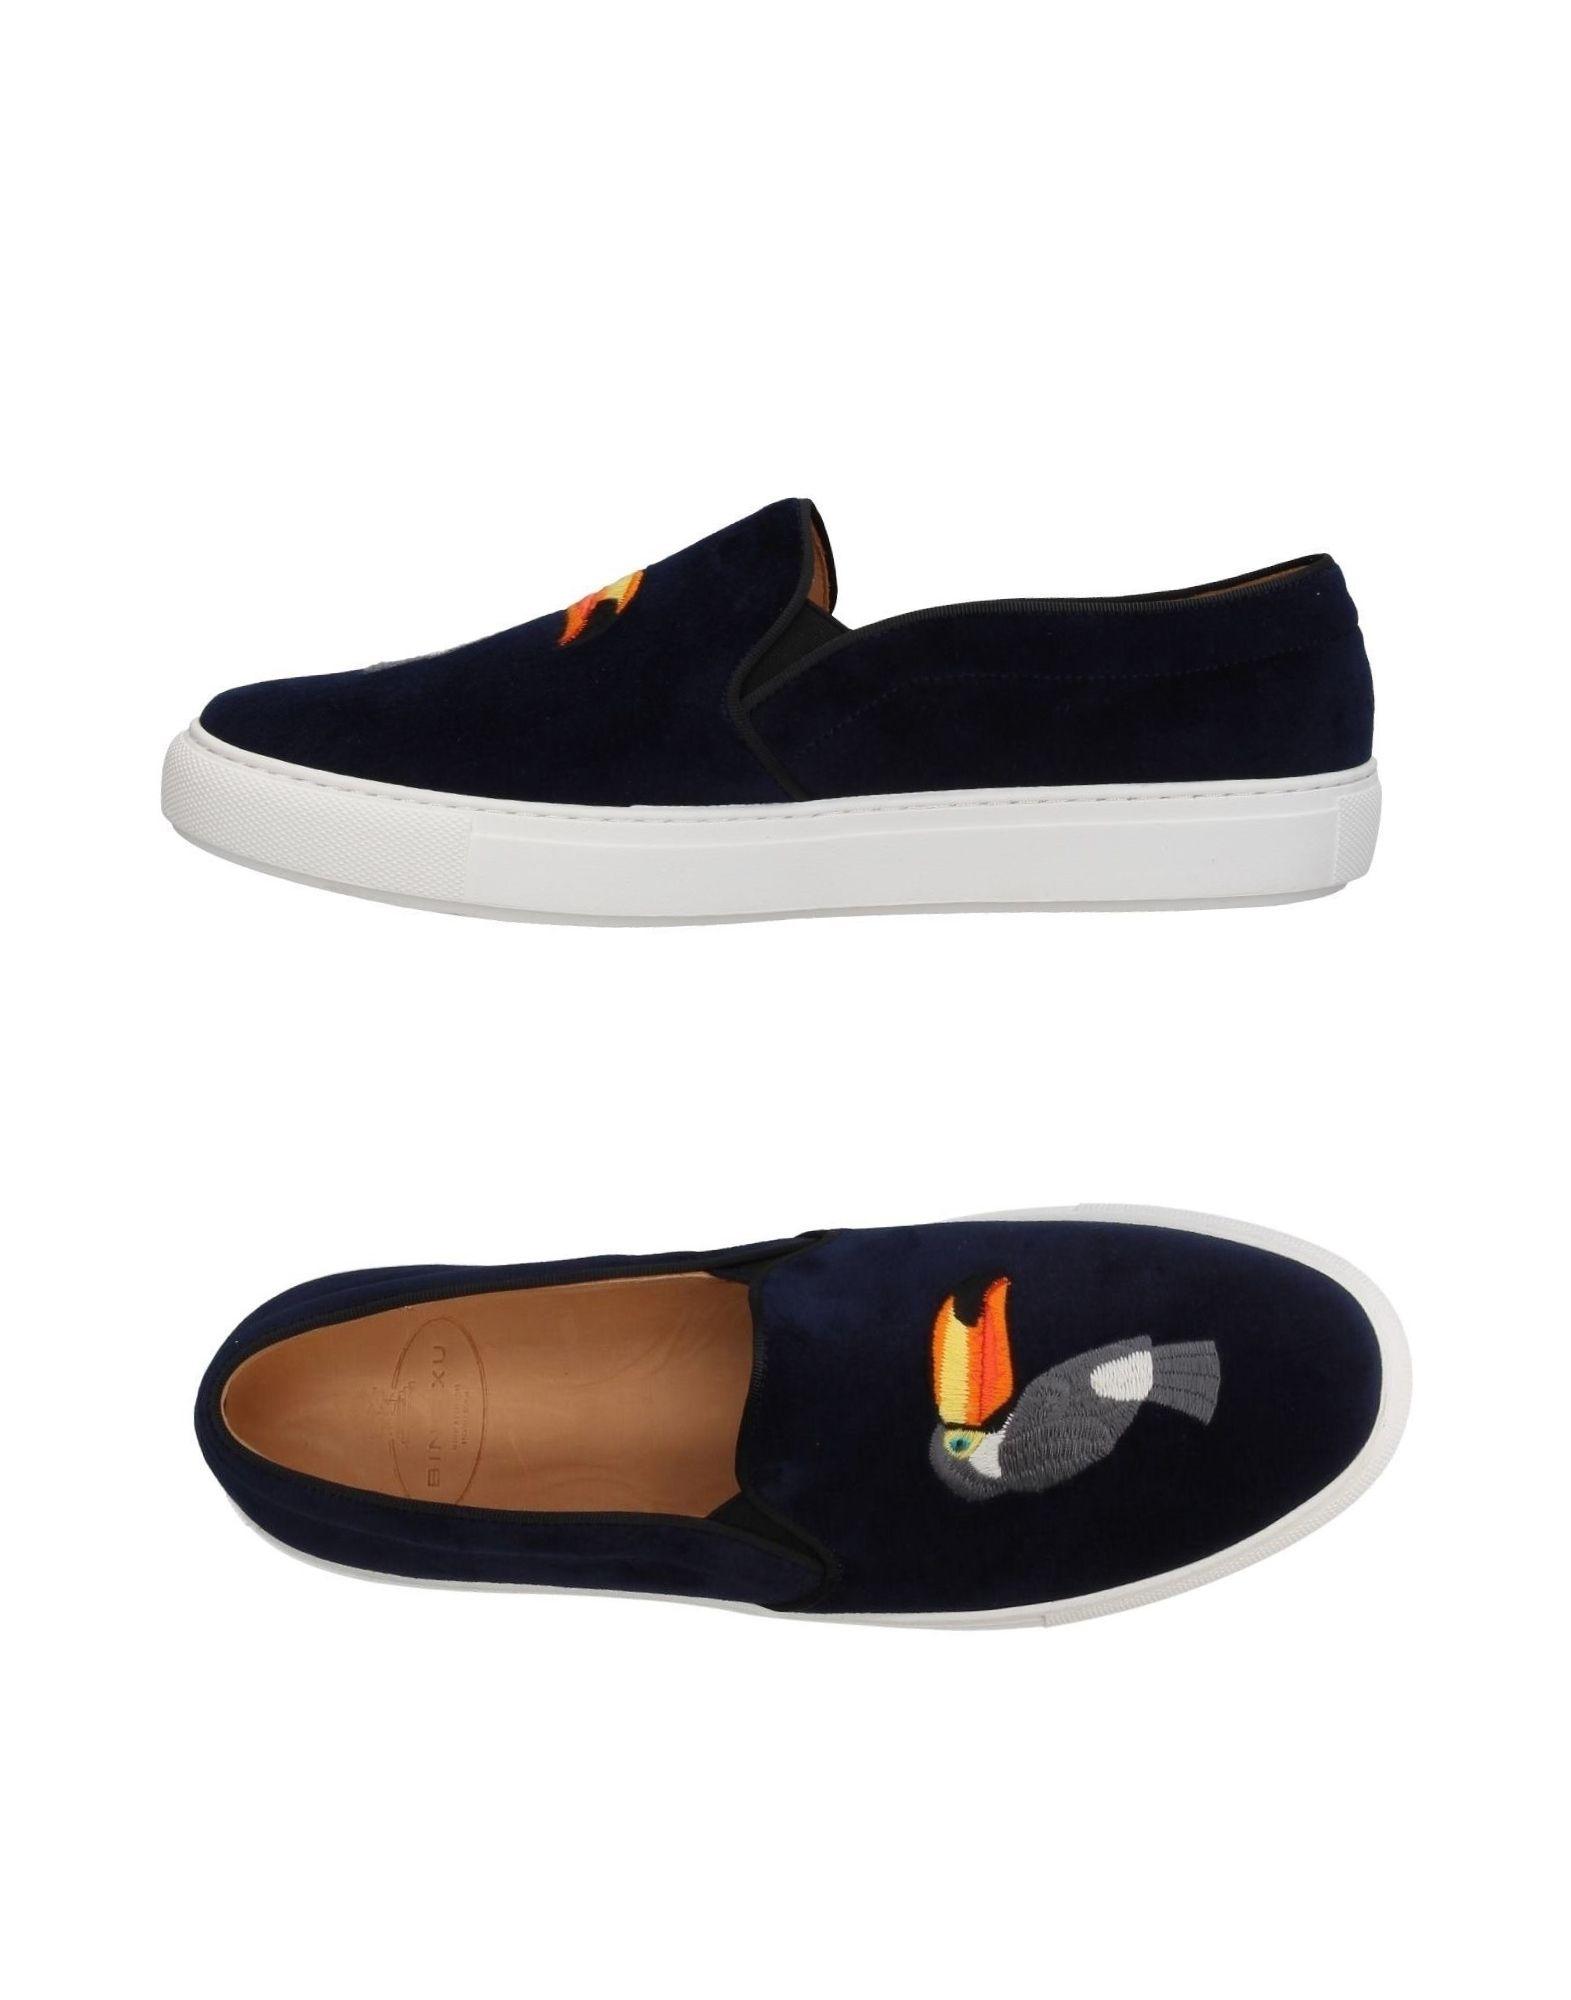 Sneakers Bing Xu Homme - Sneakers Bing Xu sur